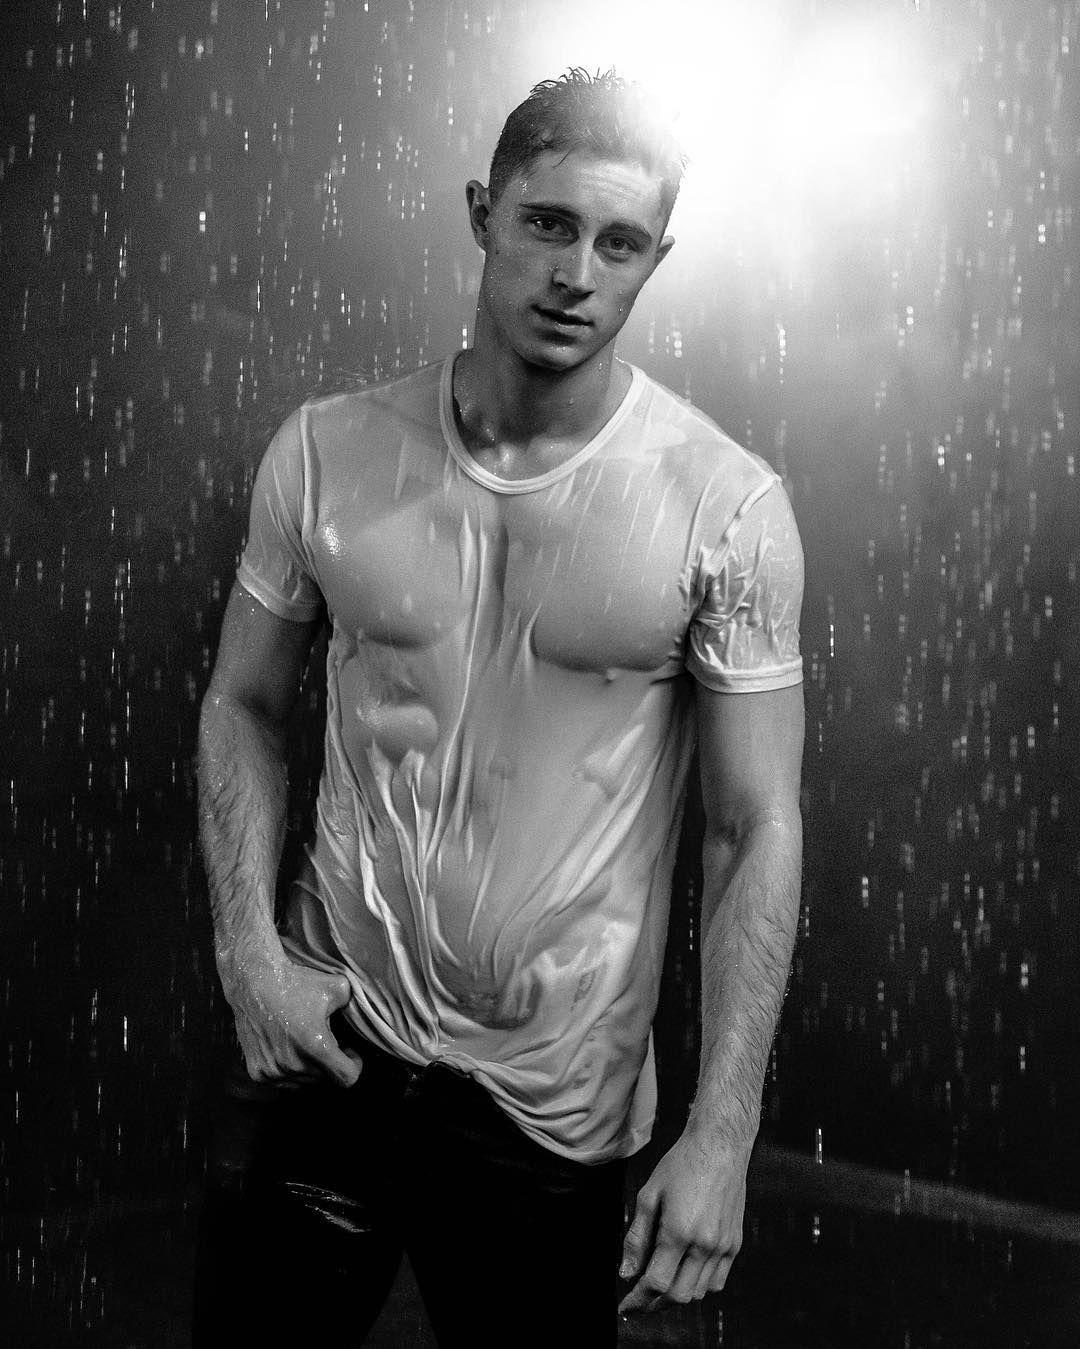 white t shirt in the rain